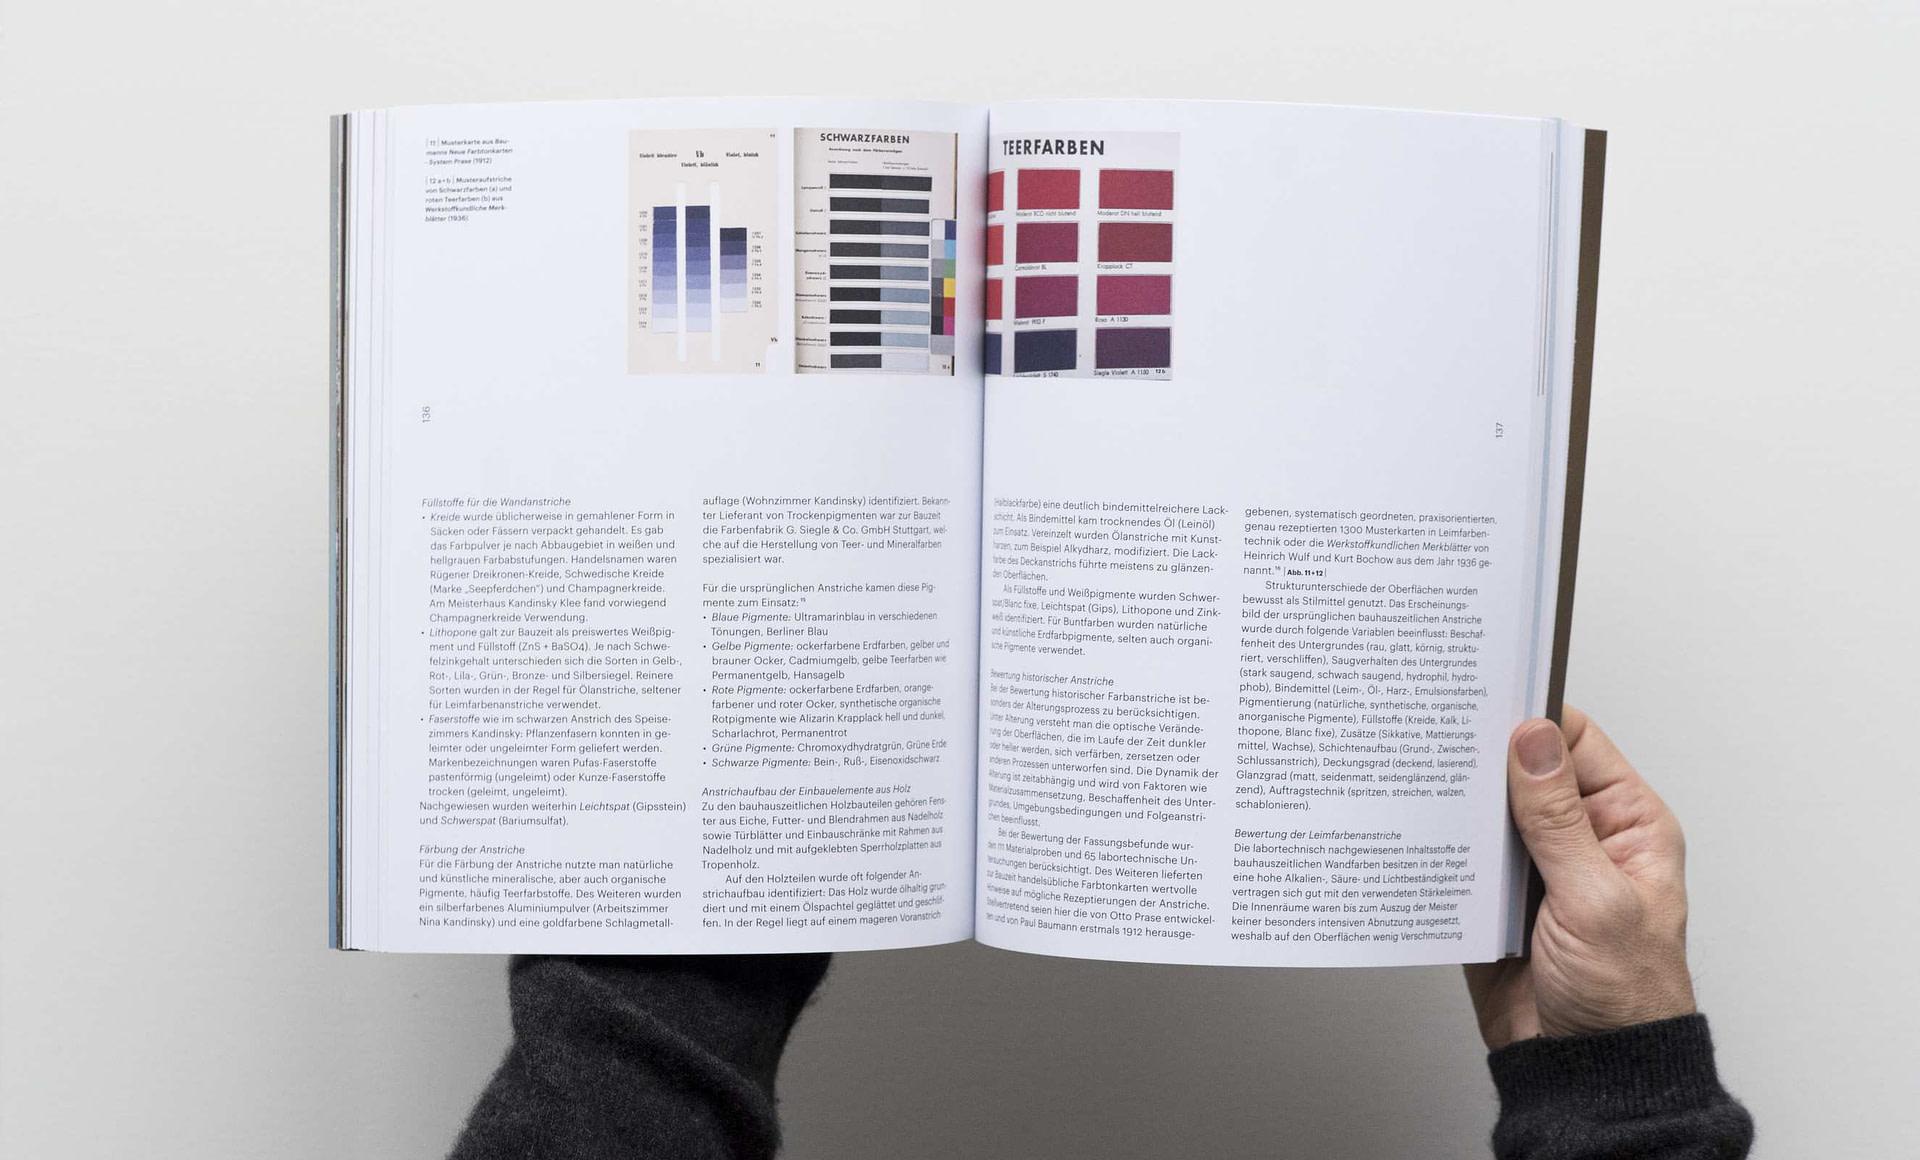 meisterhaus-kandinsky-klee-book-14-2650x1600px